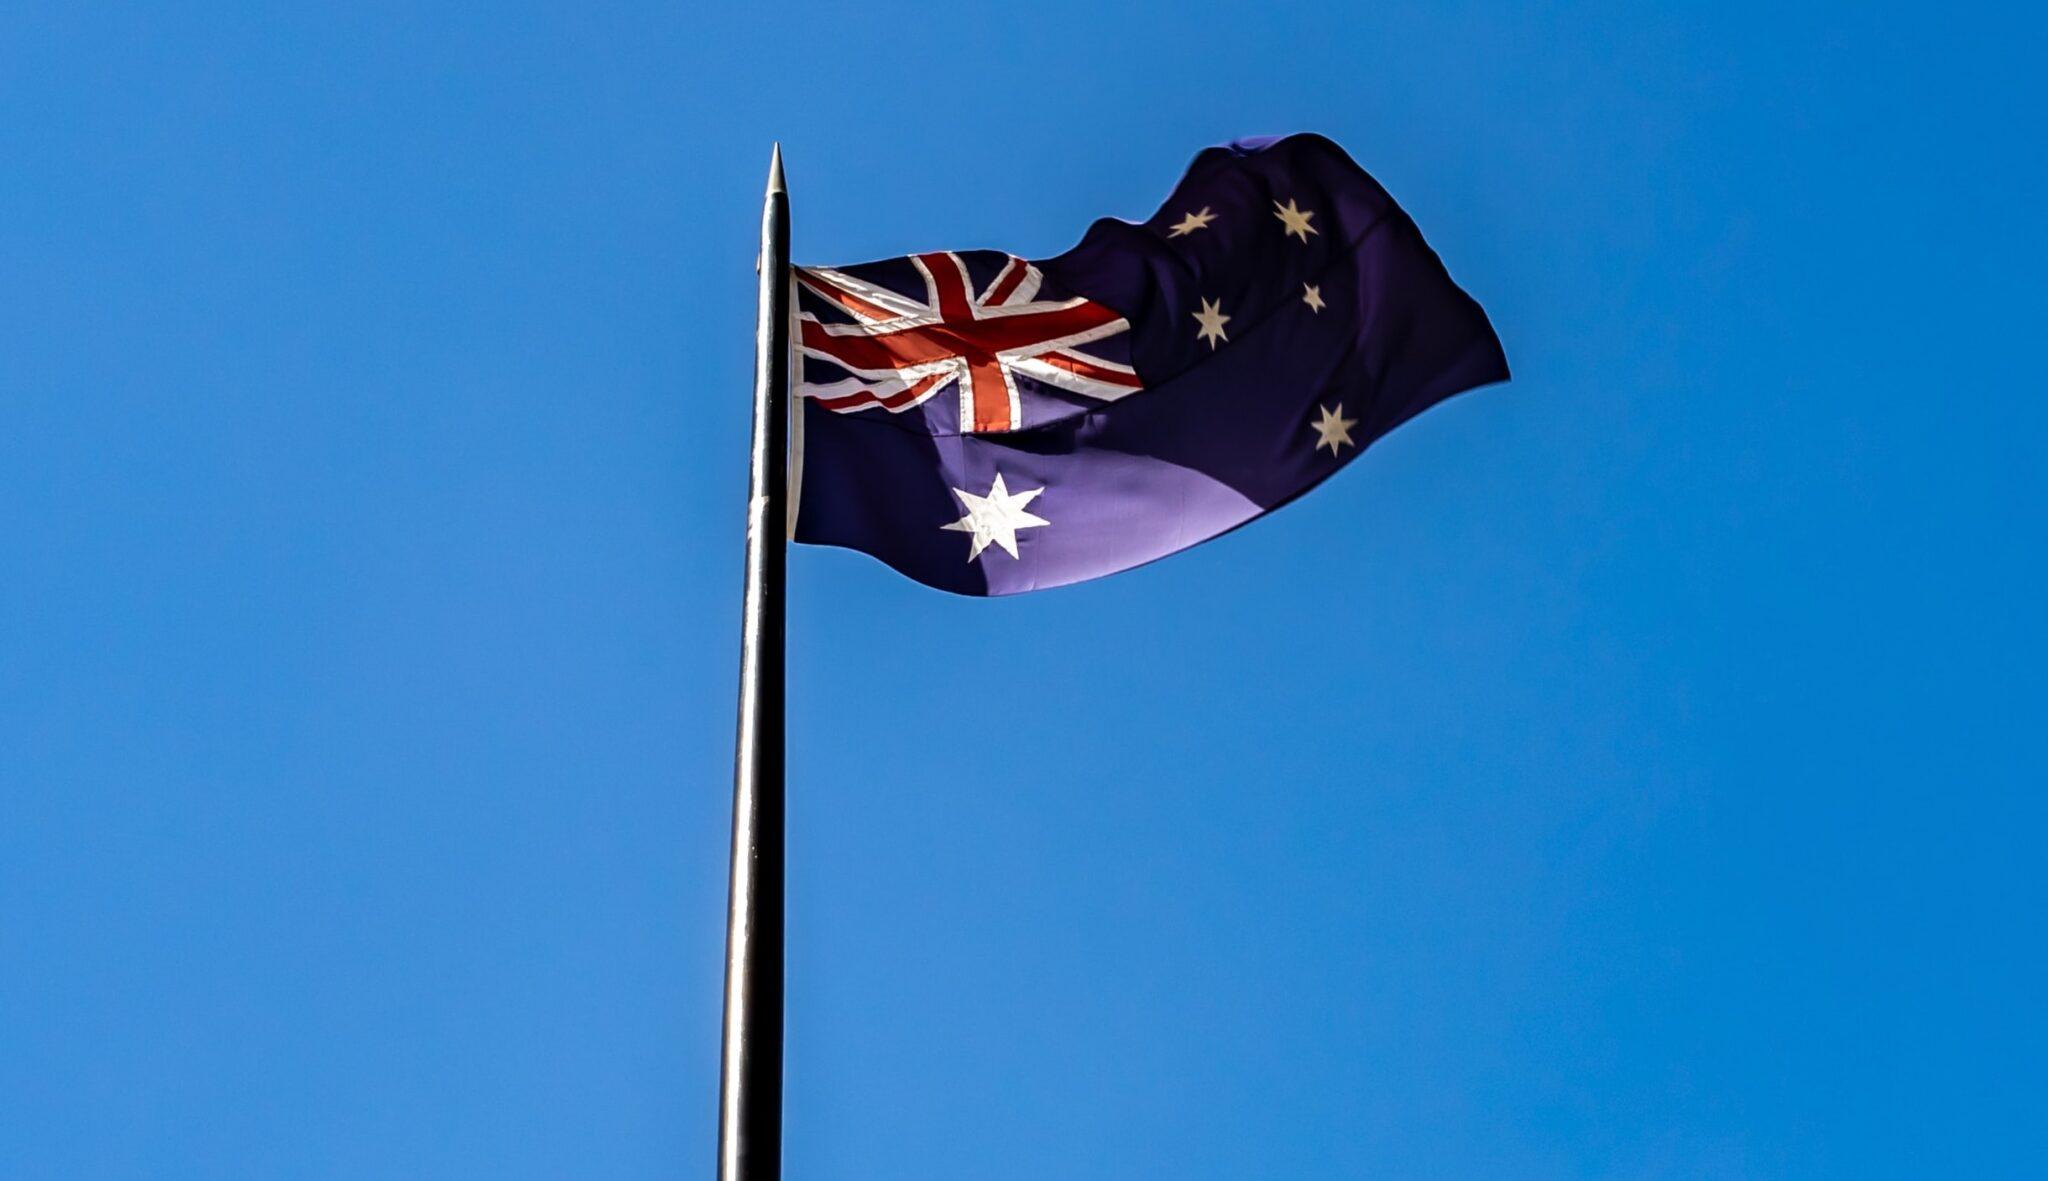 Australia trade deal paves way for 'climate-destructive deals'